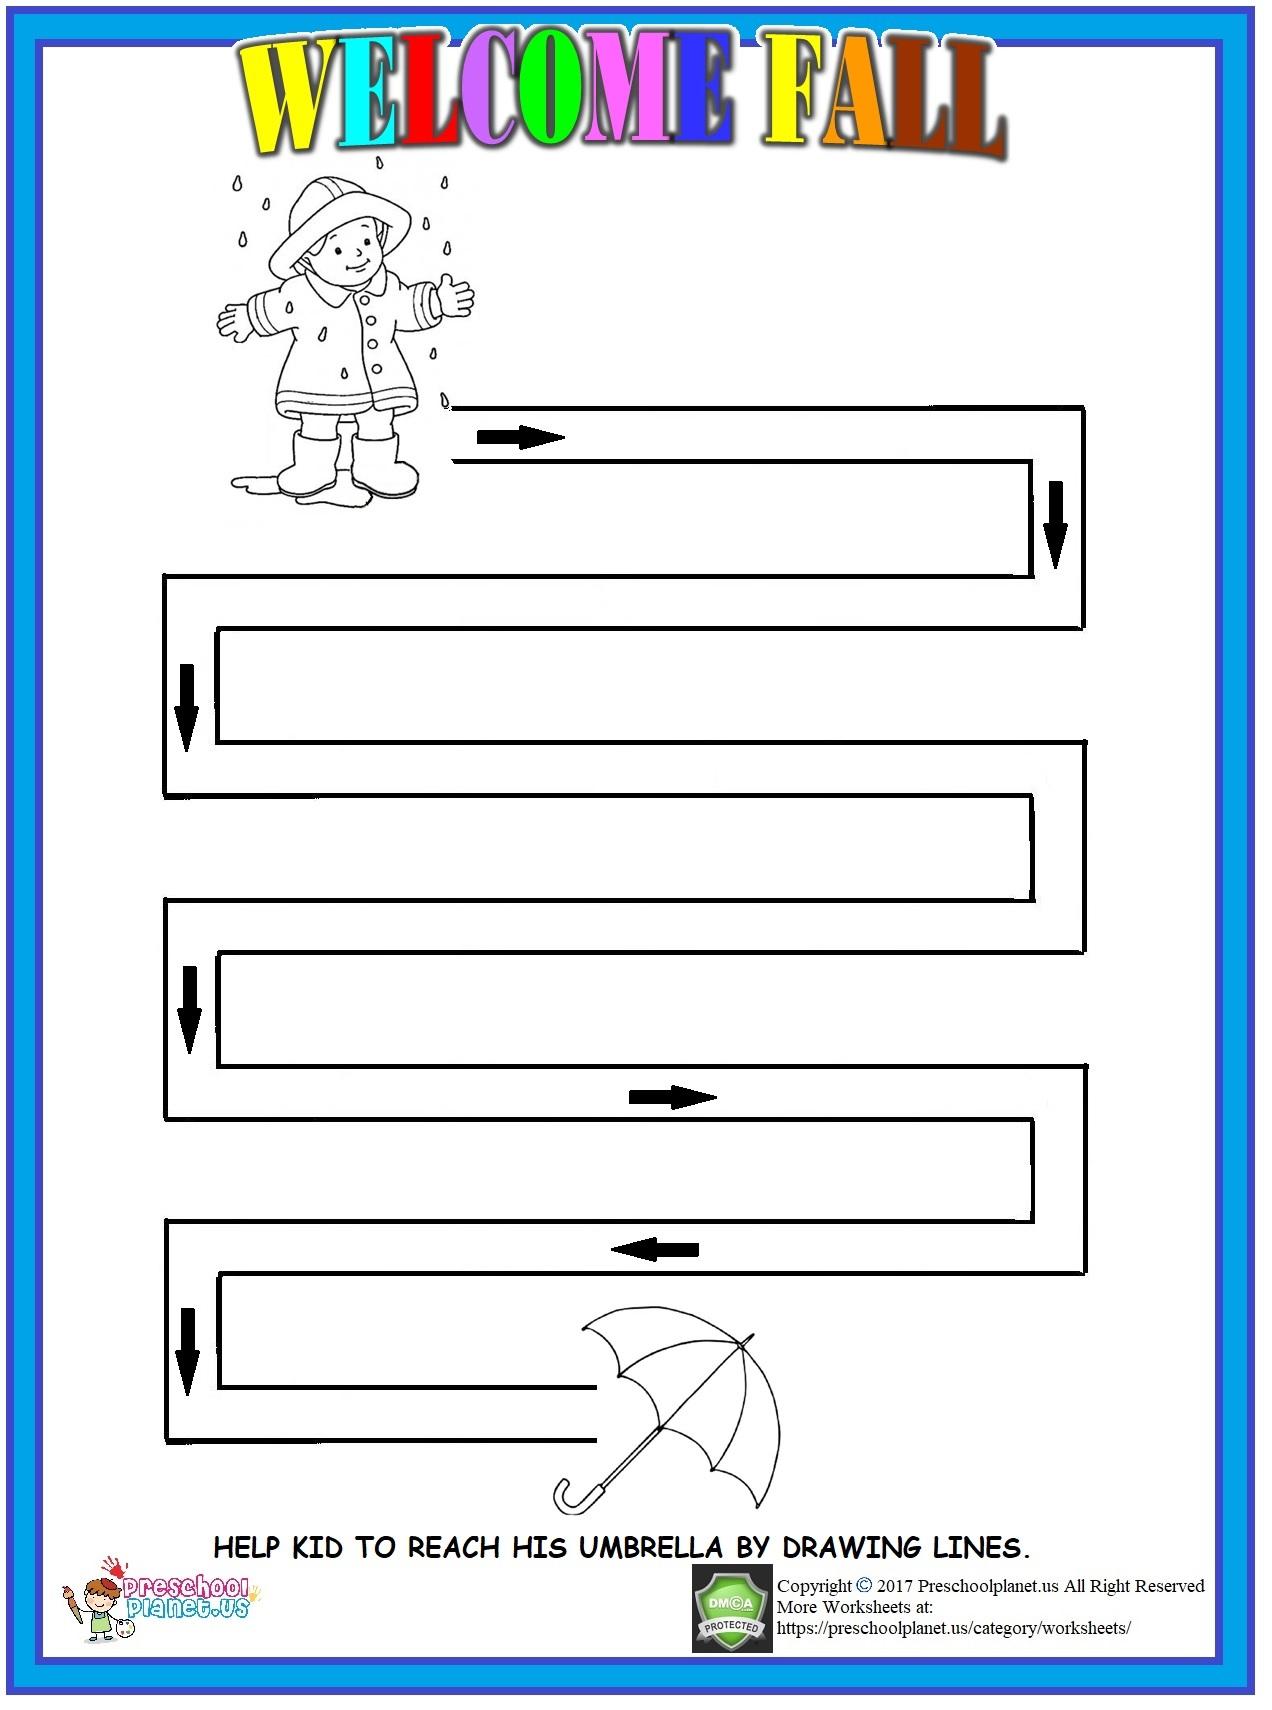 Fall Maze Worksheet For Kids Preschoolplanet